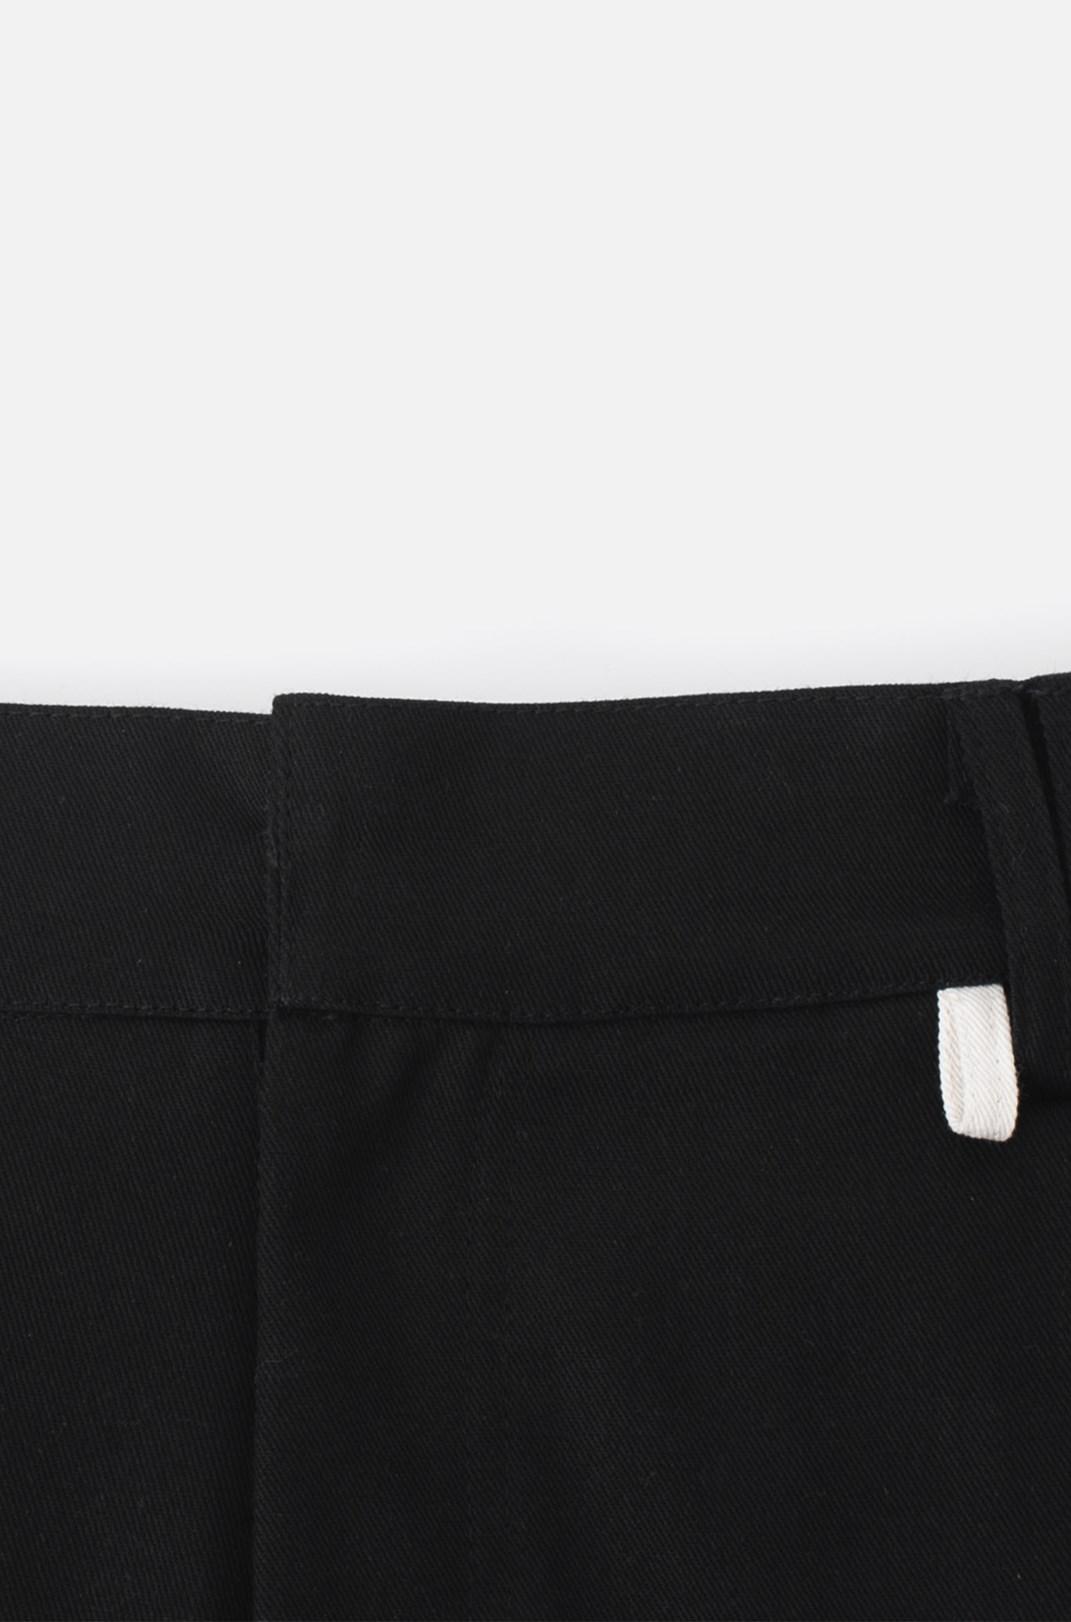 Calça Cargo Approve Workwear Preta